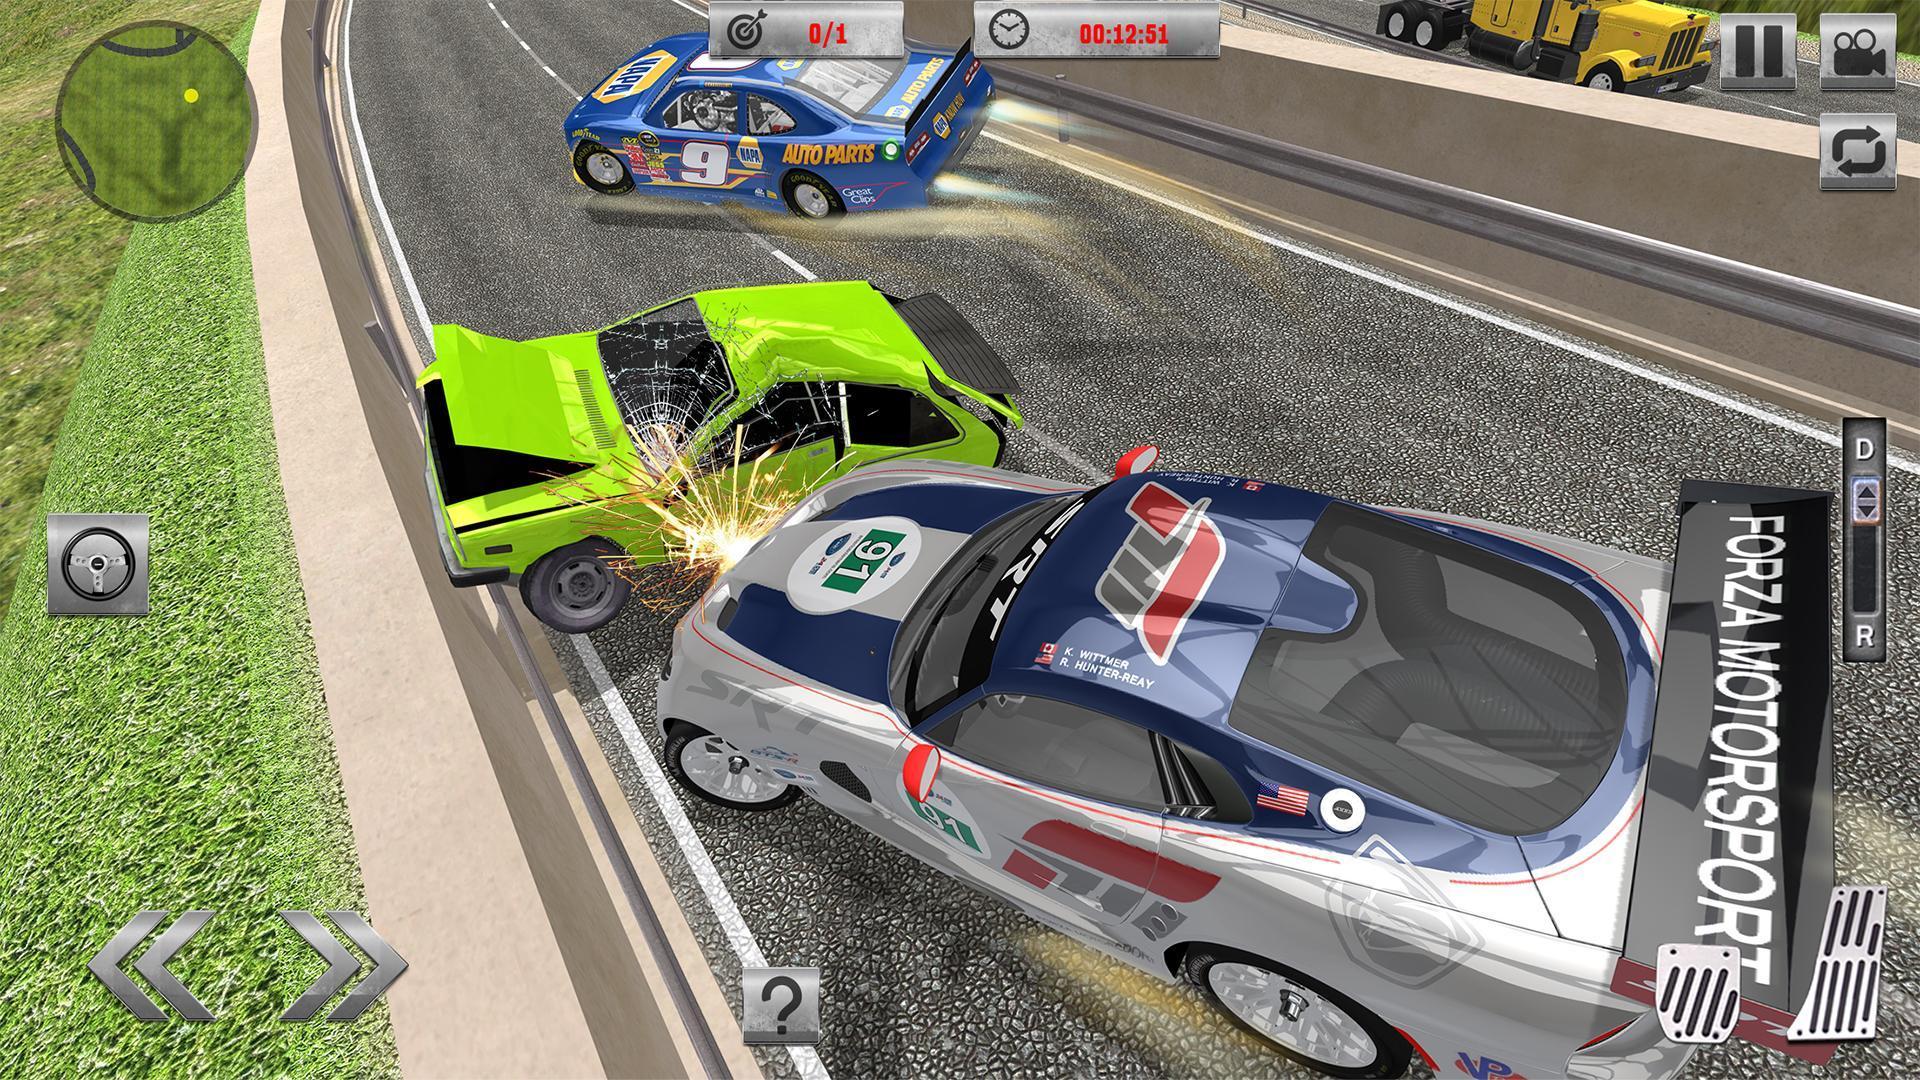 Car Crash Simulator & Beam Crash Stunt Racing SG for Android - APK